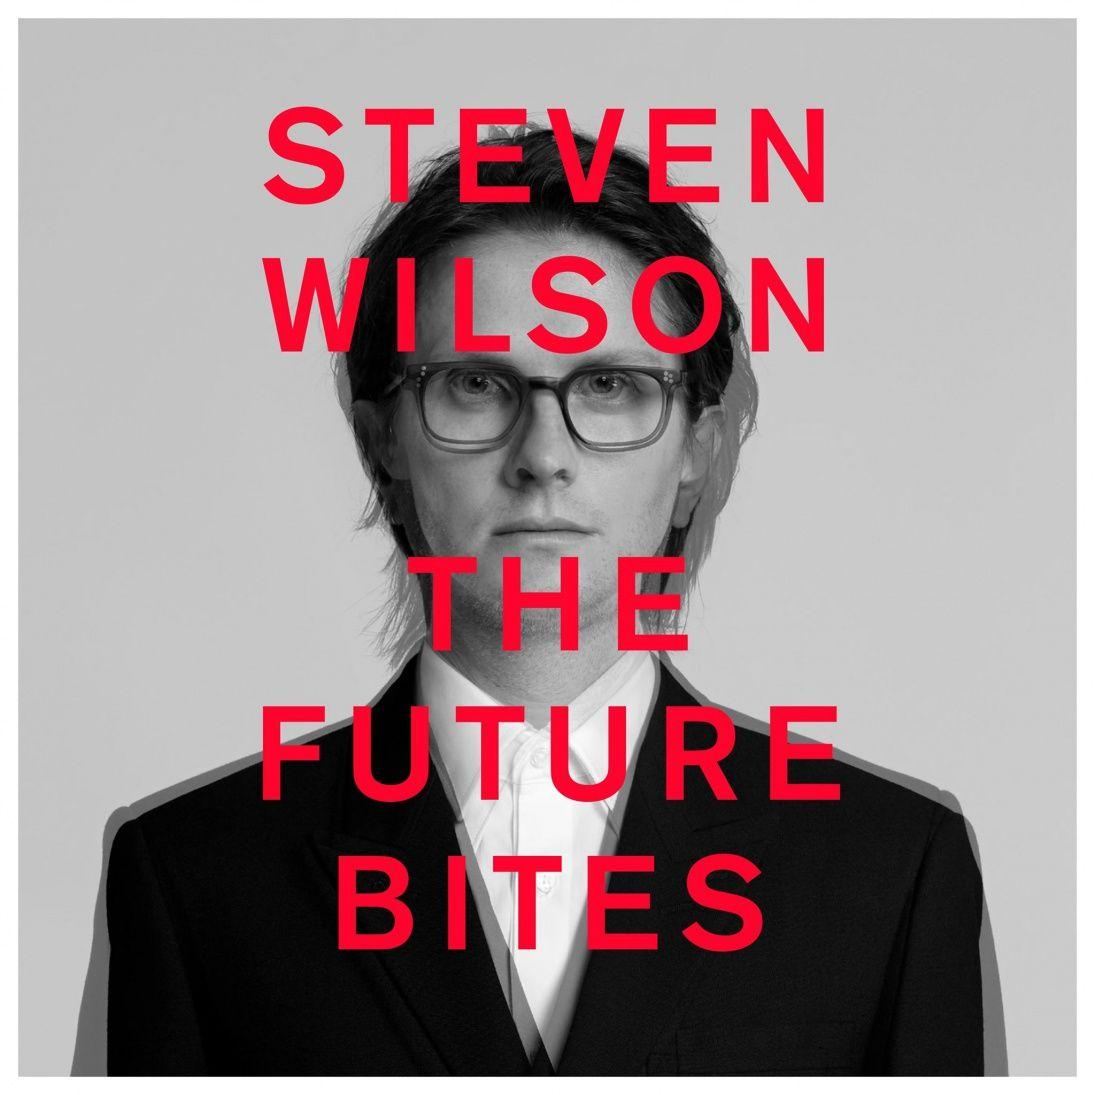 Steven Wilson - Future Bites - LP